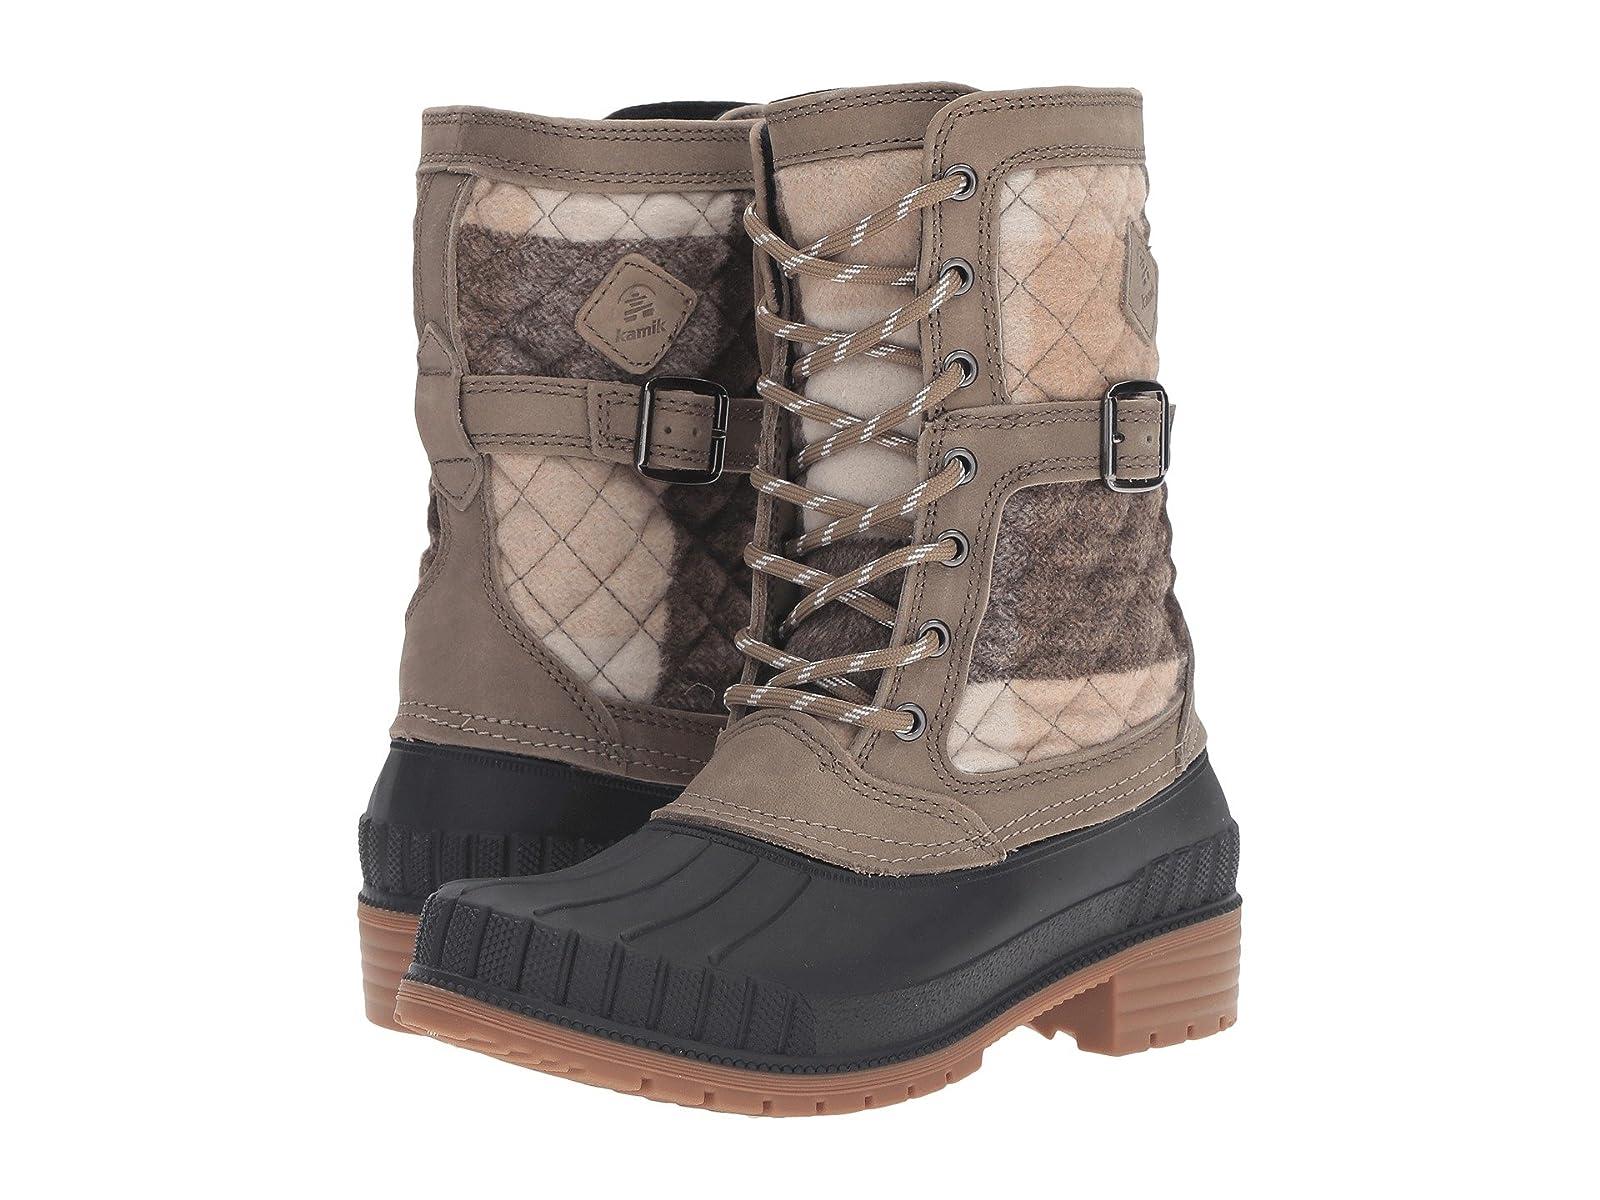 Kamik SiennaCheap and distinctive eye-catching shoes